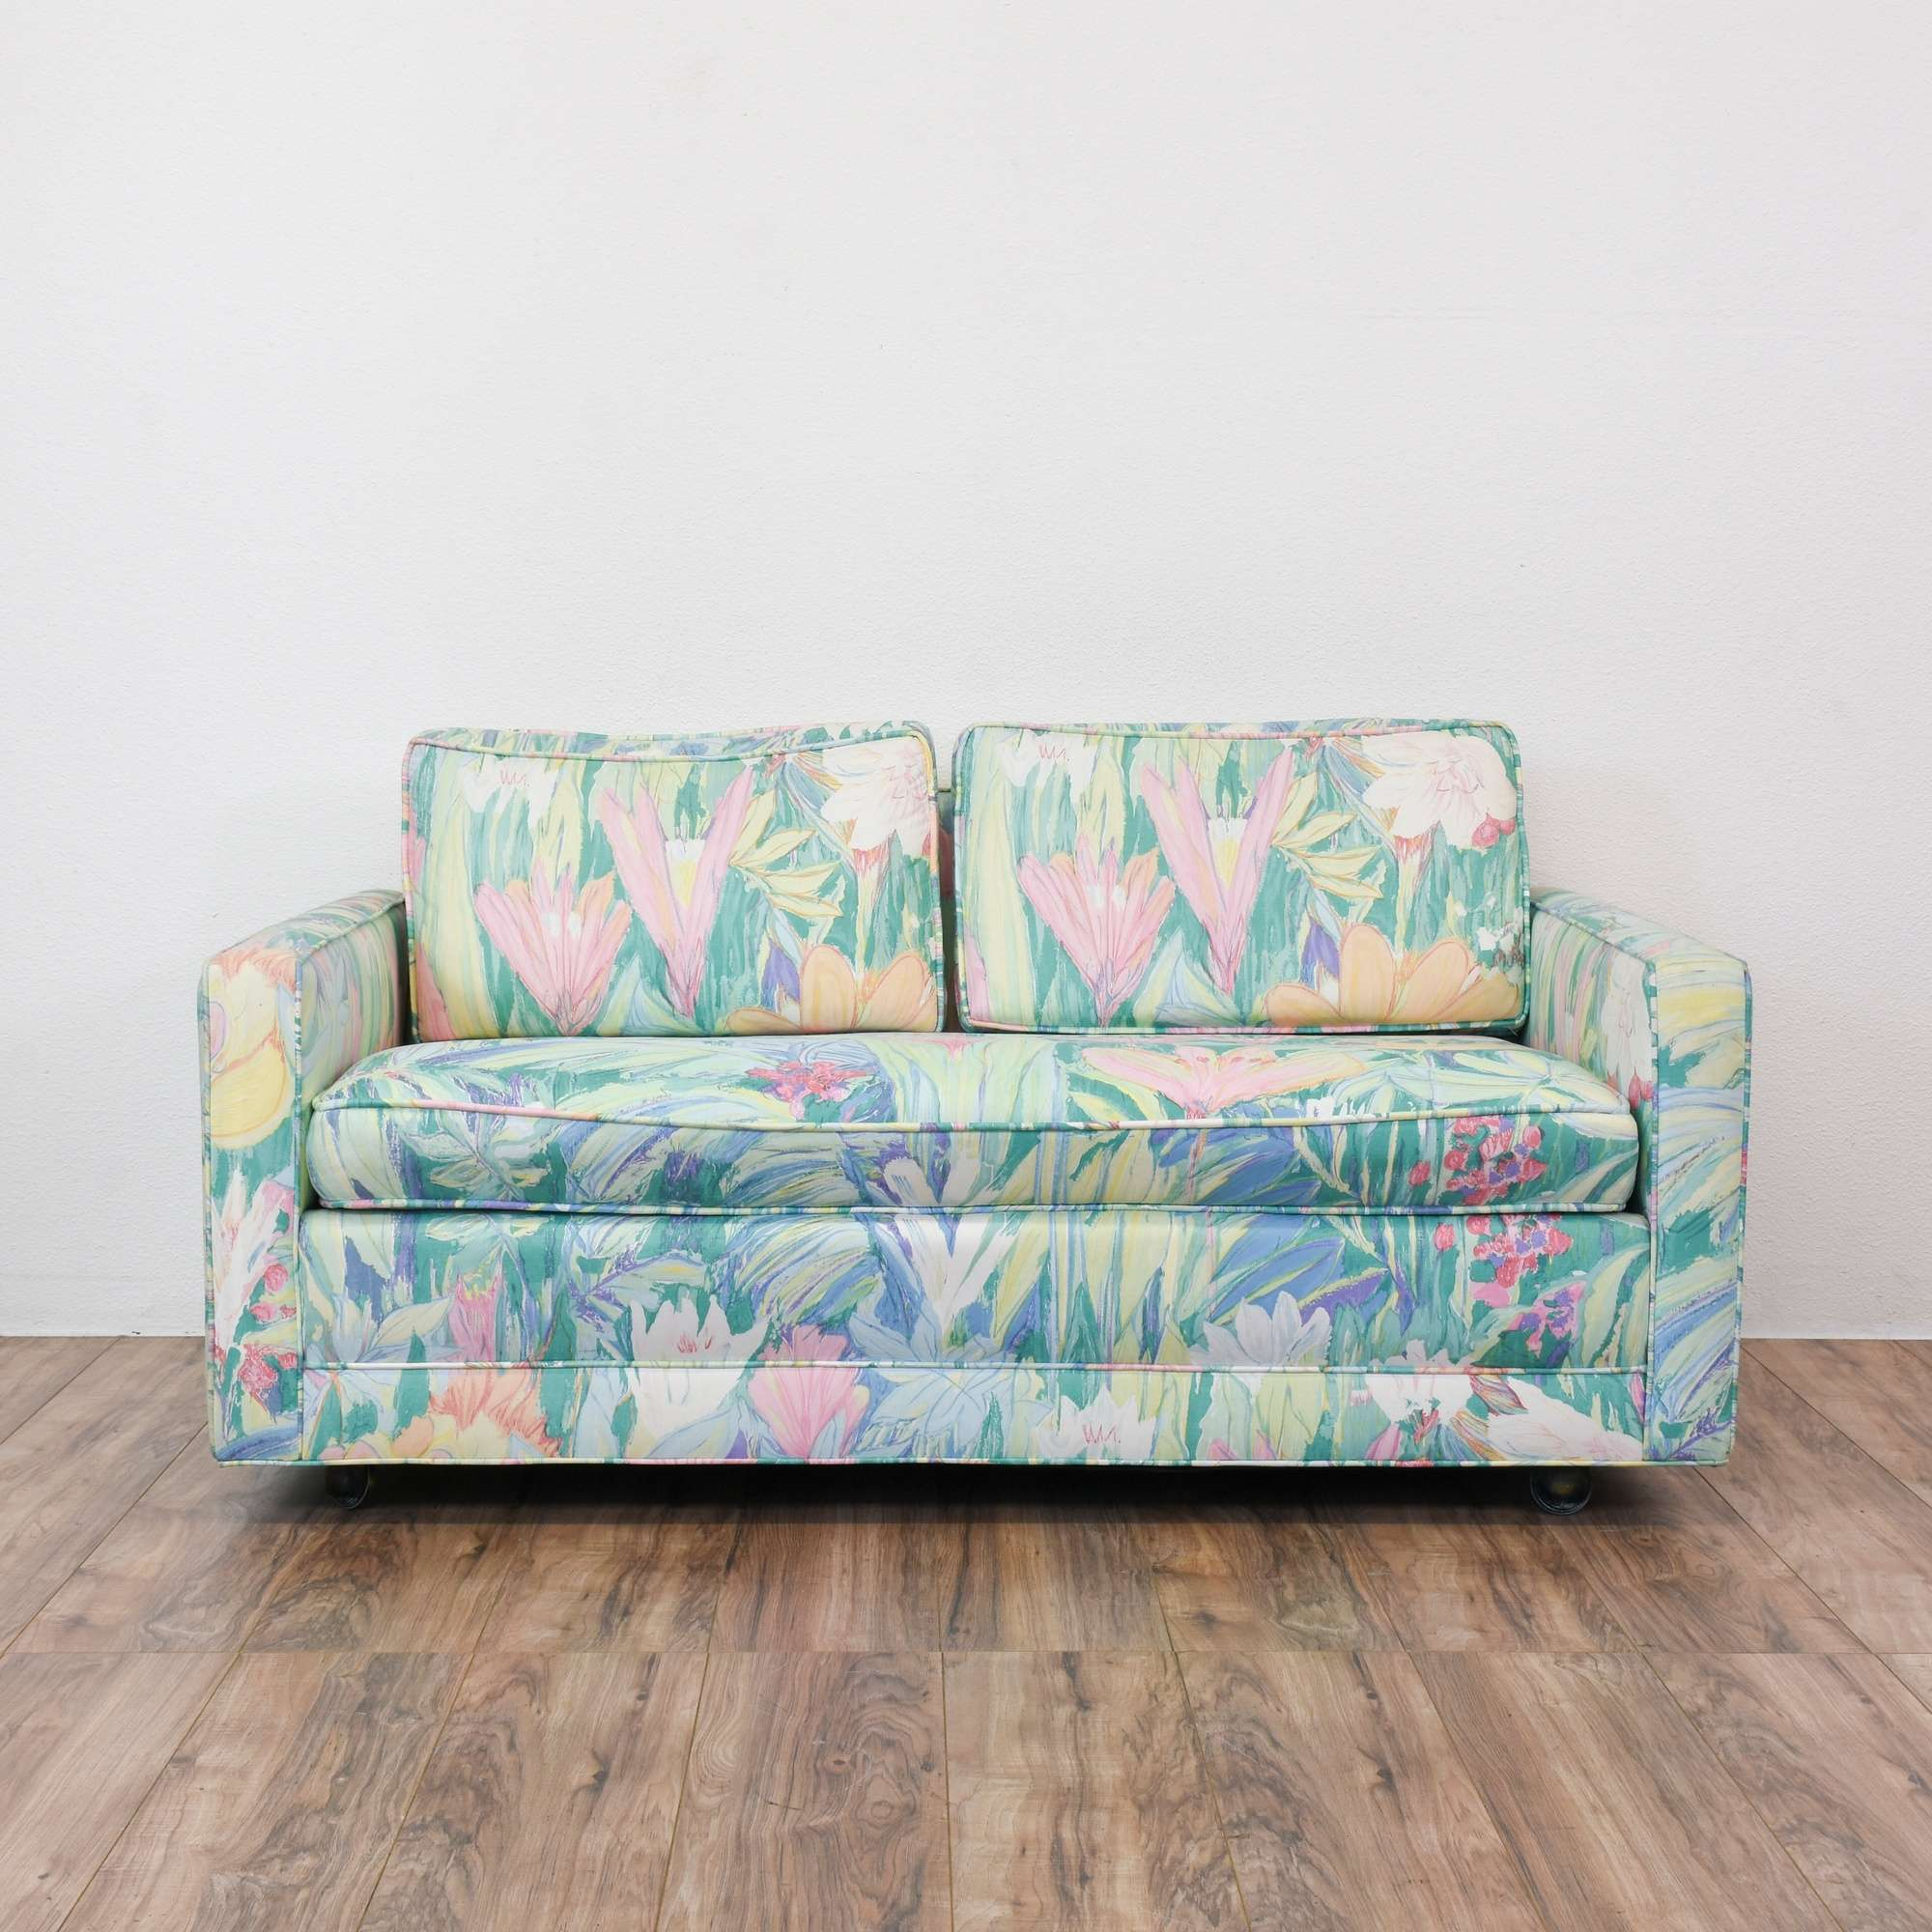 thomasville loveseats design vintage floral and loveseat sofa sofas furniture collectibles uhuru sold